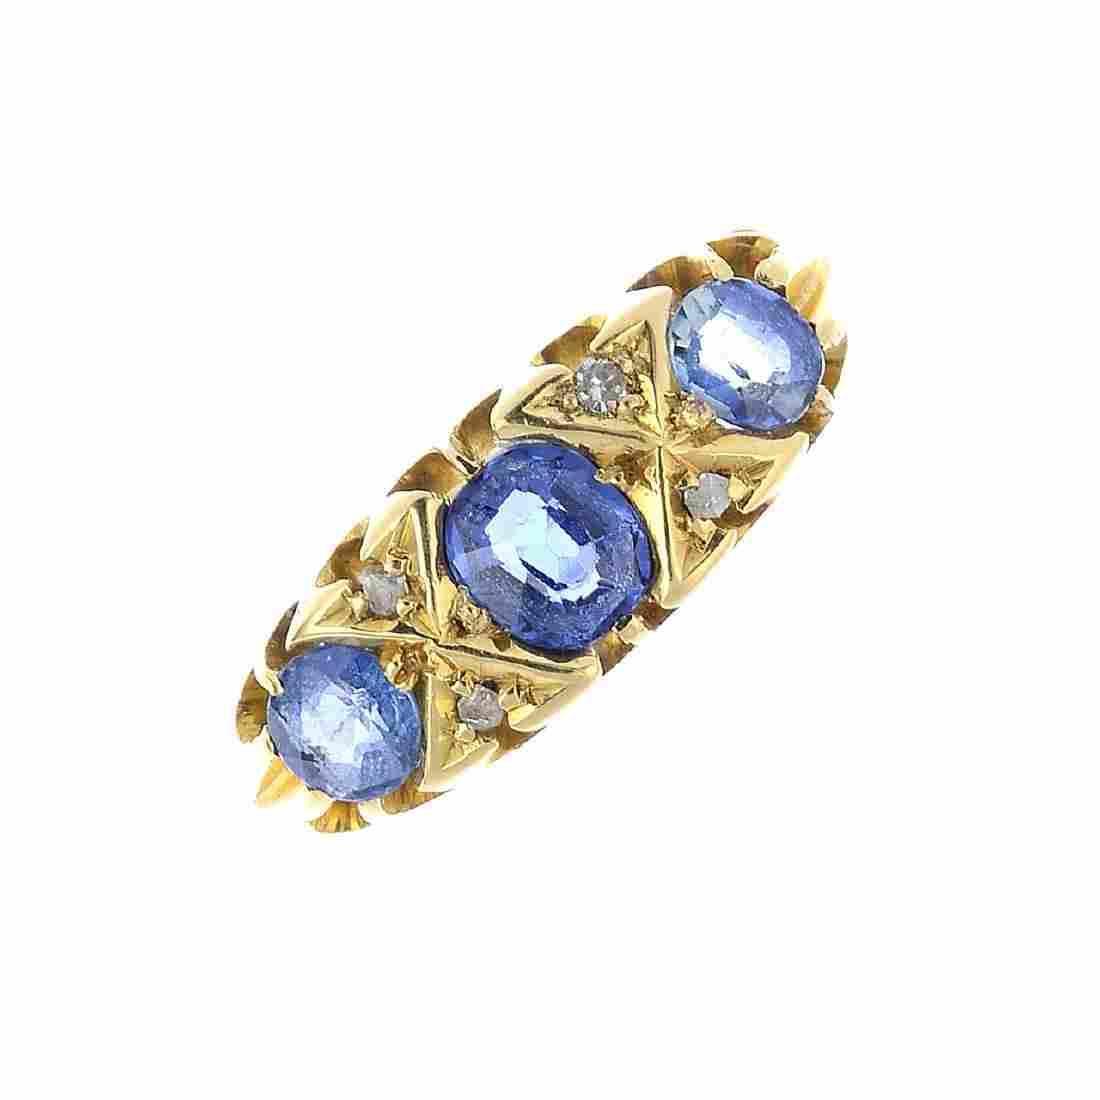 An Edwardian 18ct gold sapphire and diamond dress ring.